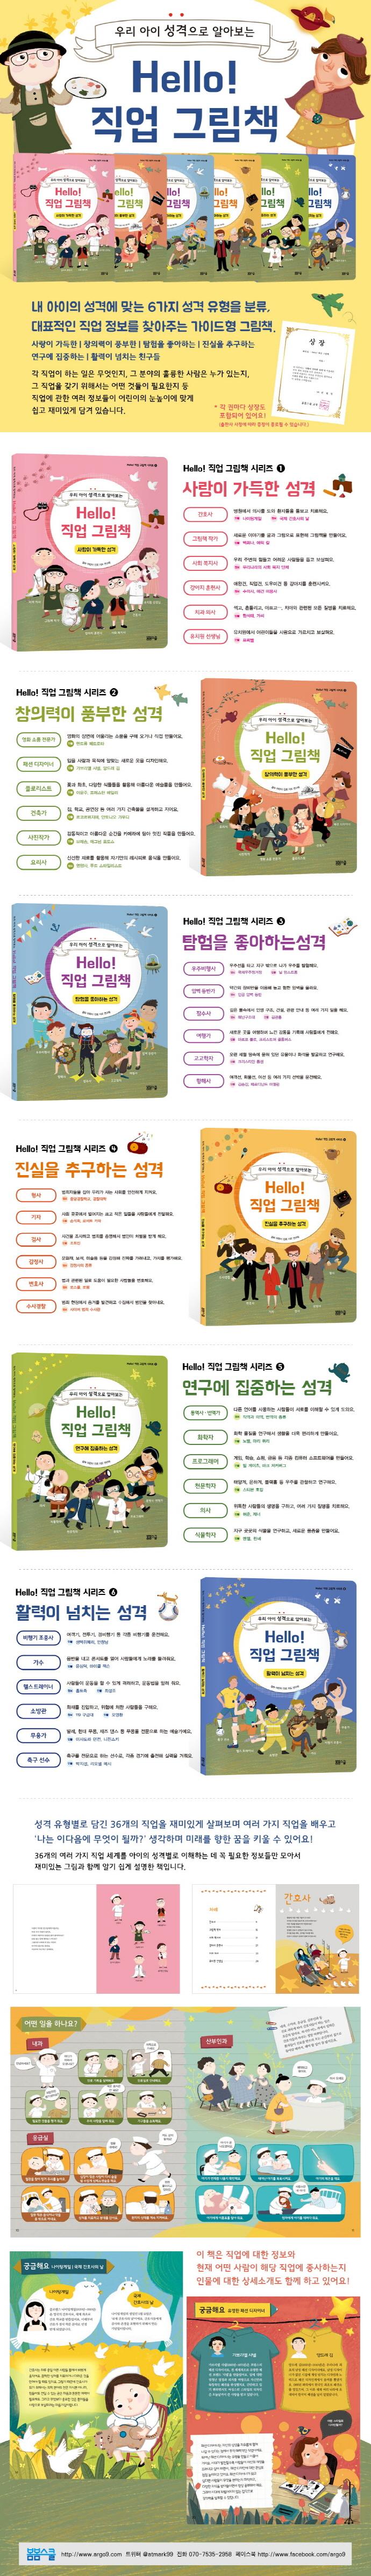 Hello! 직업 그림책: 진실을 추구하는 성격(우리 아이 성격으로 알아보는)(Hello! 직업 그림책 시리즈 4)(? 도서 상세이미지